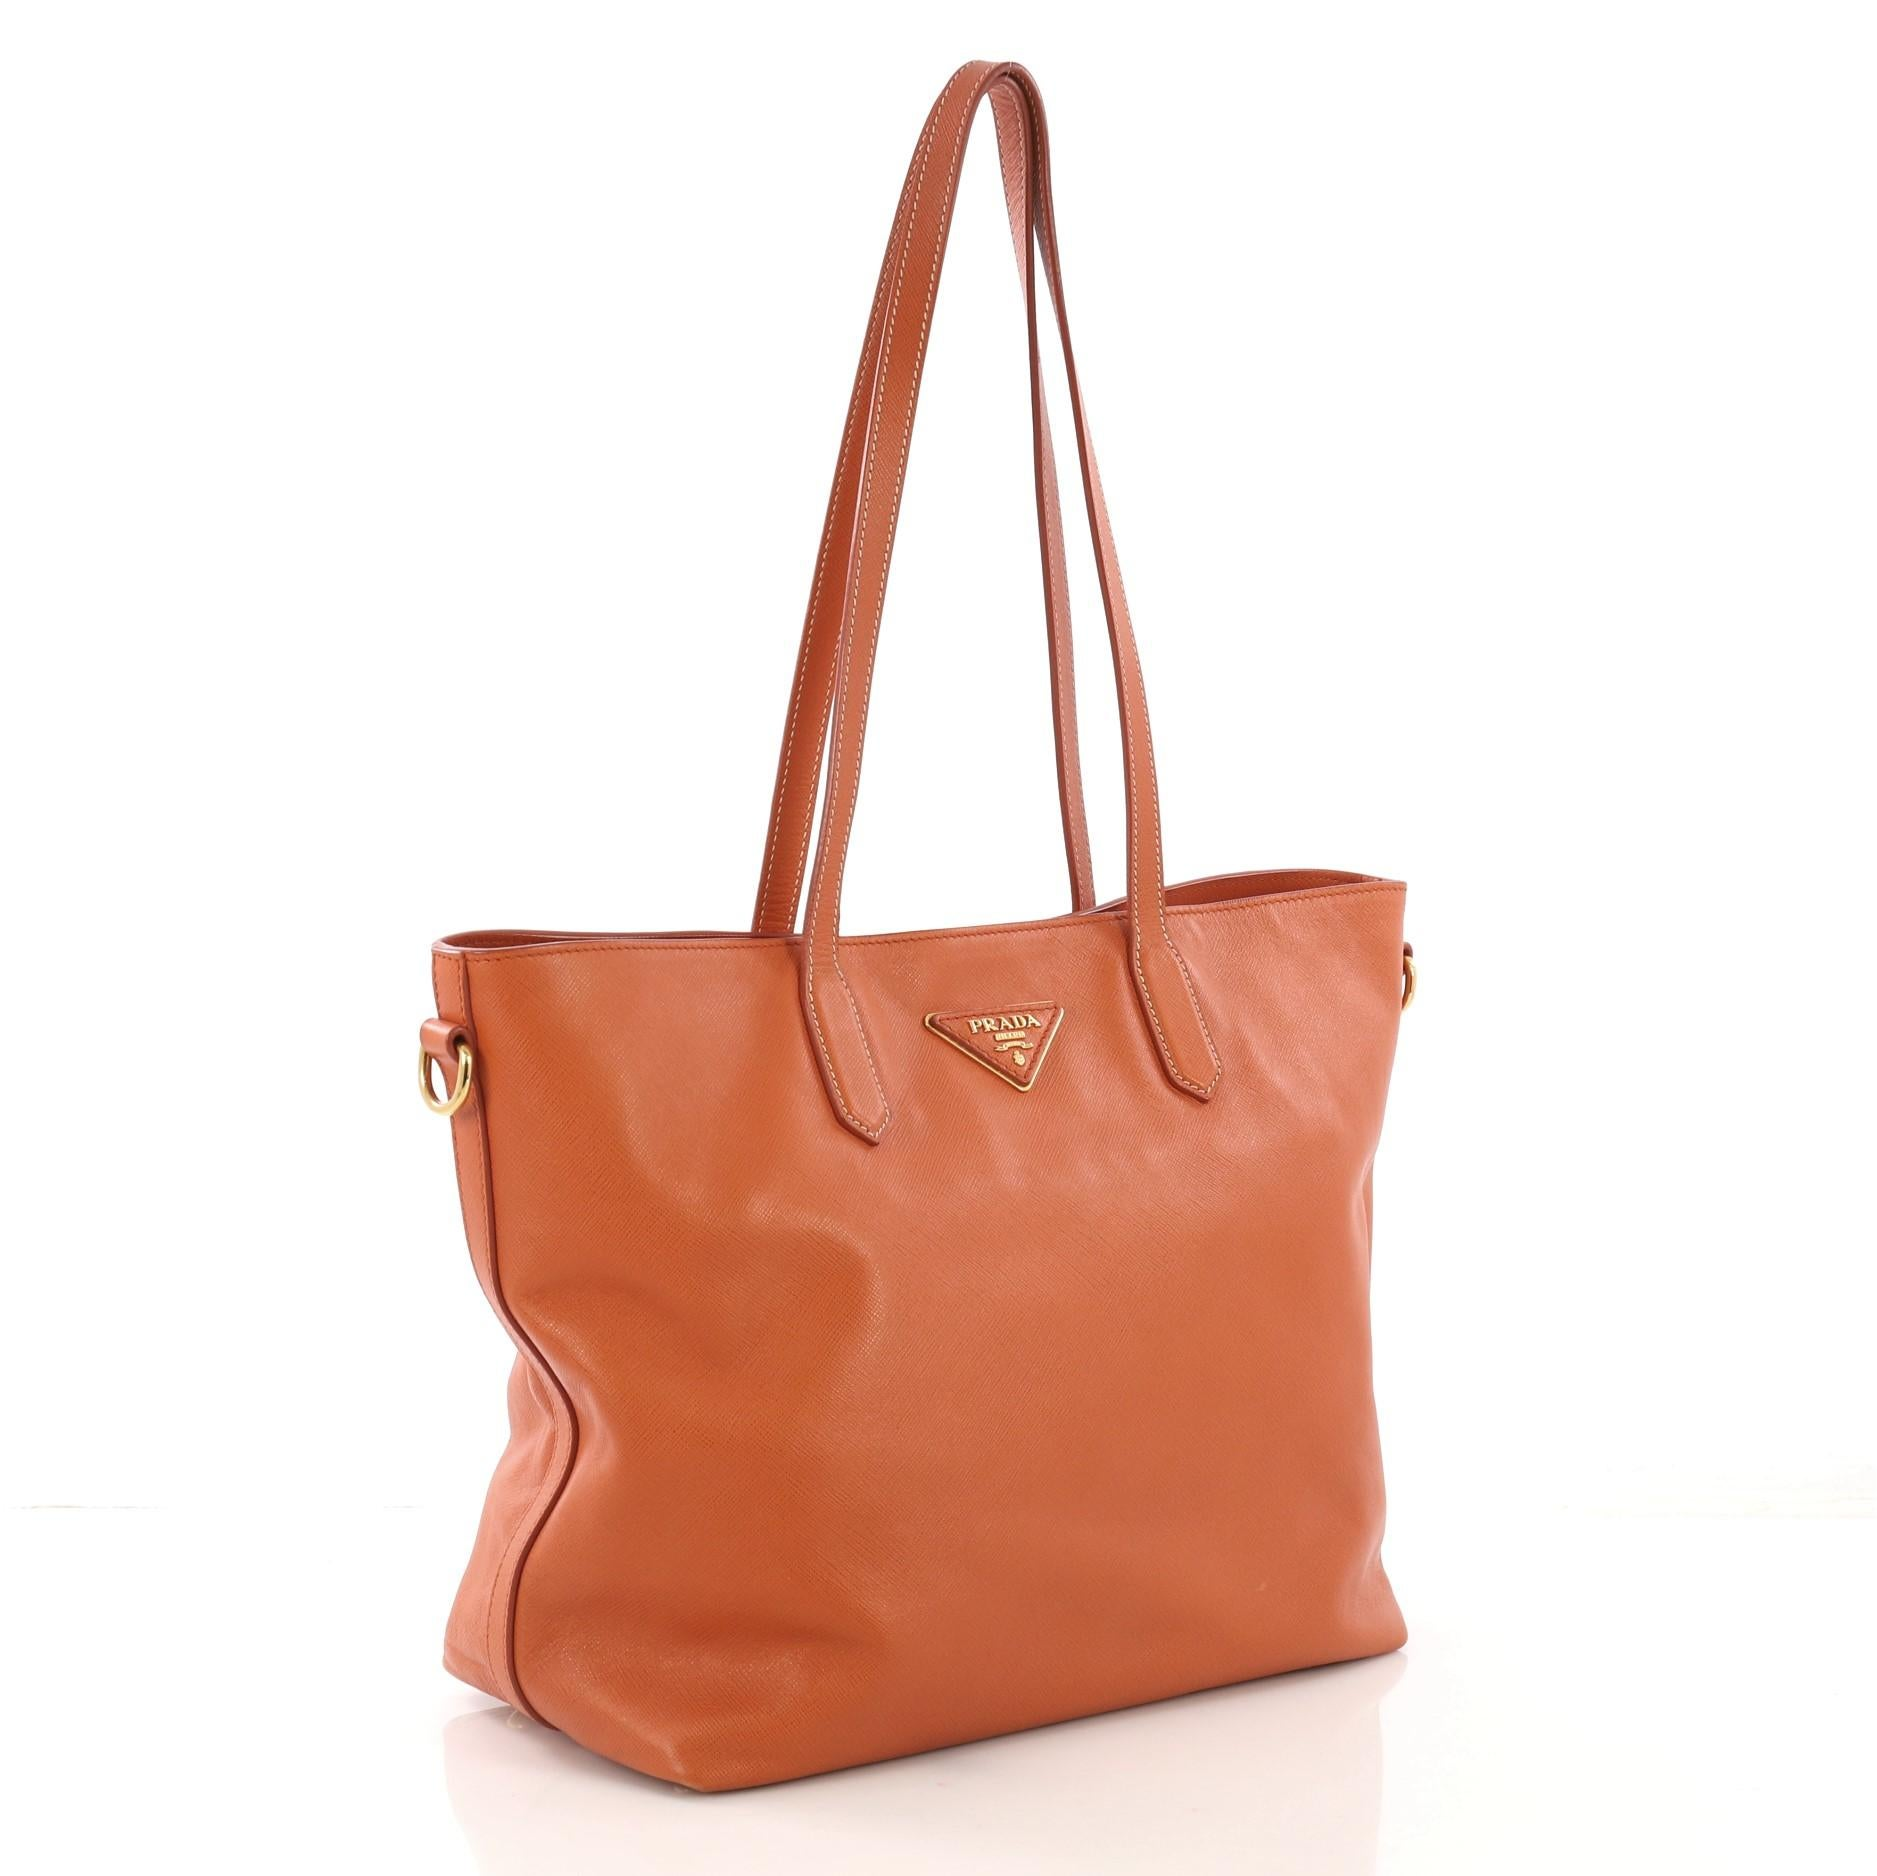 3e7fa43a2495 Prada Convertible Open Tote Saffiano Leather Medium For Sale at 1stdibs